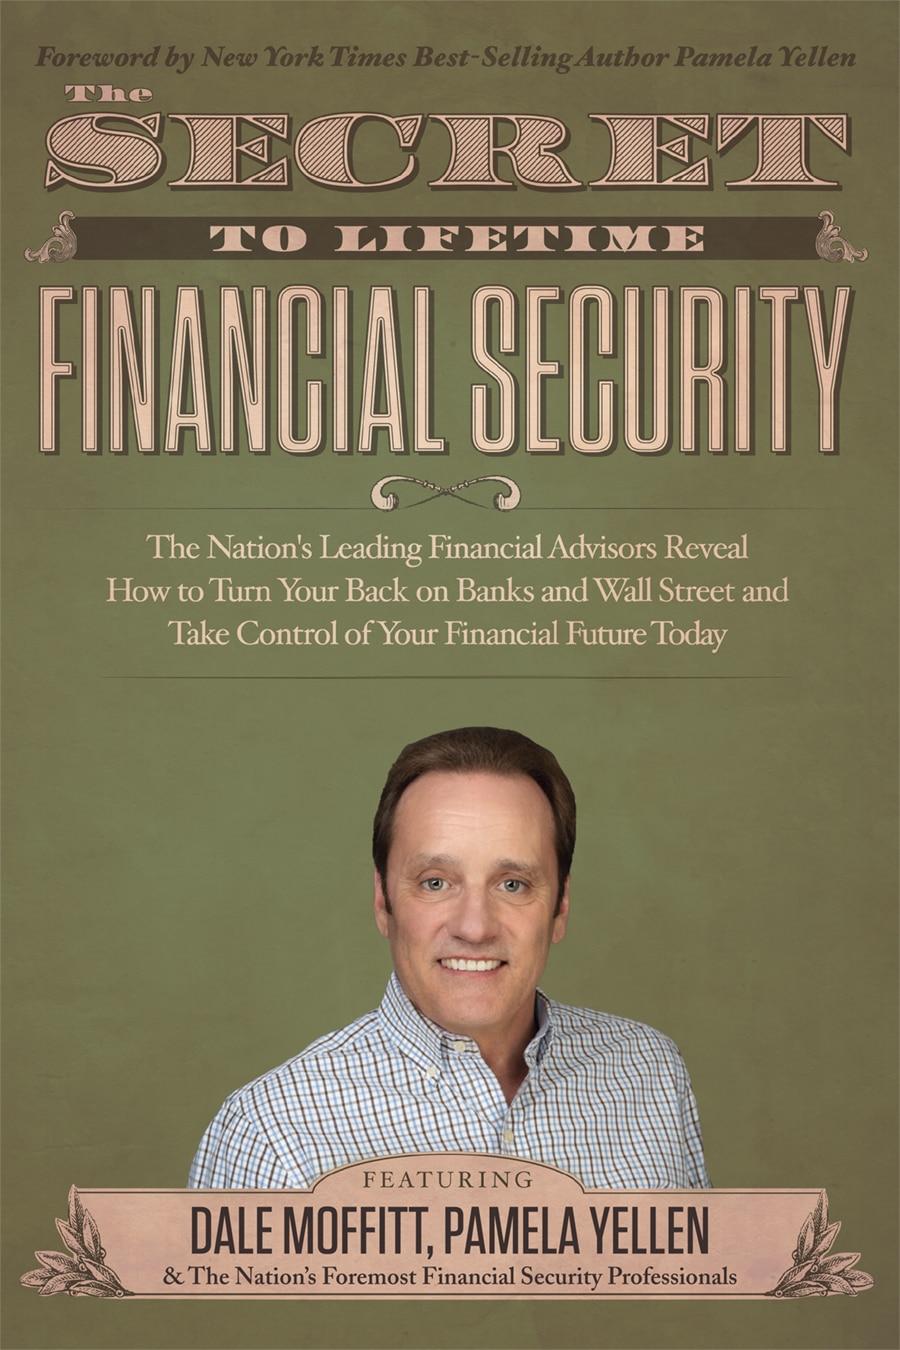 The Secret to Lifetime Security / Dale Moffitt